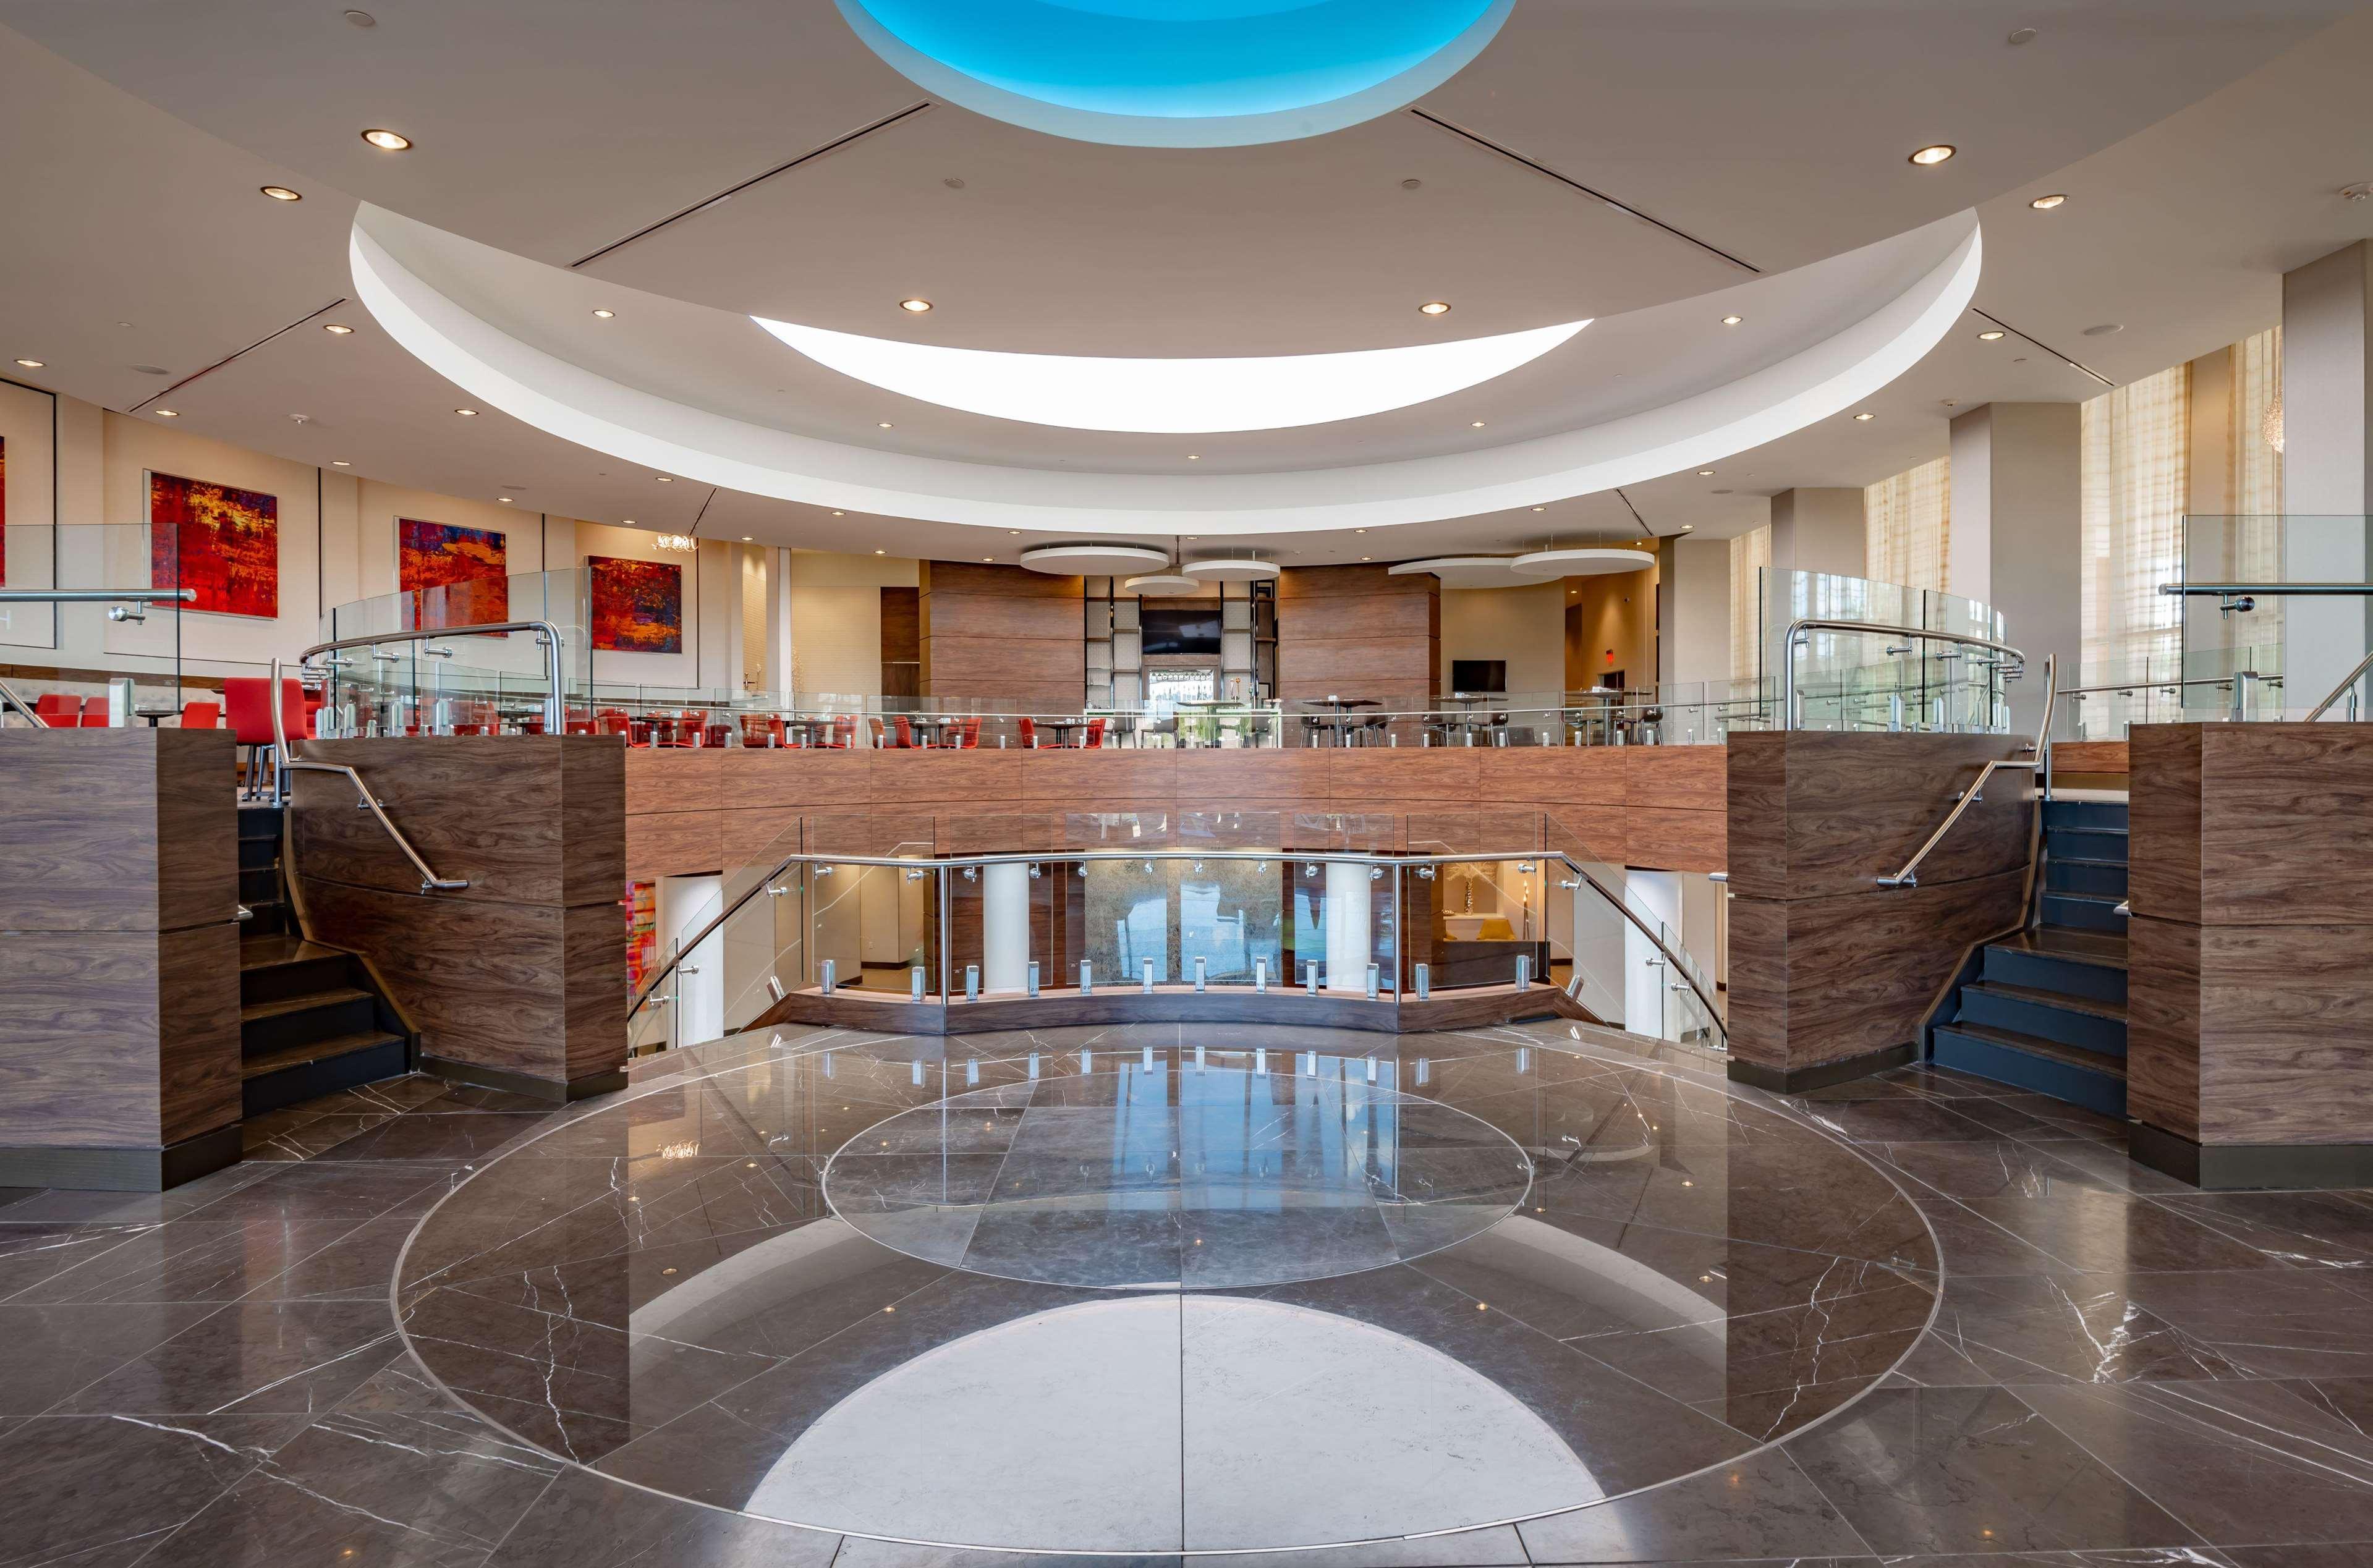 Hilton Garden Inn Dallas at Hurst Conference Center image 11